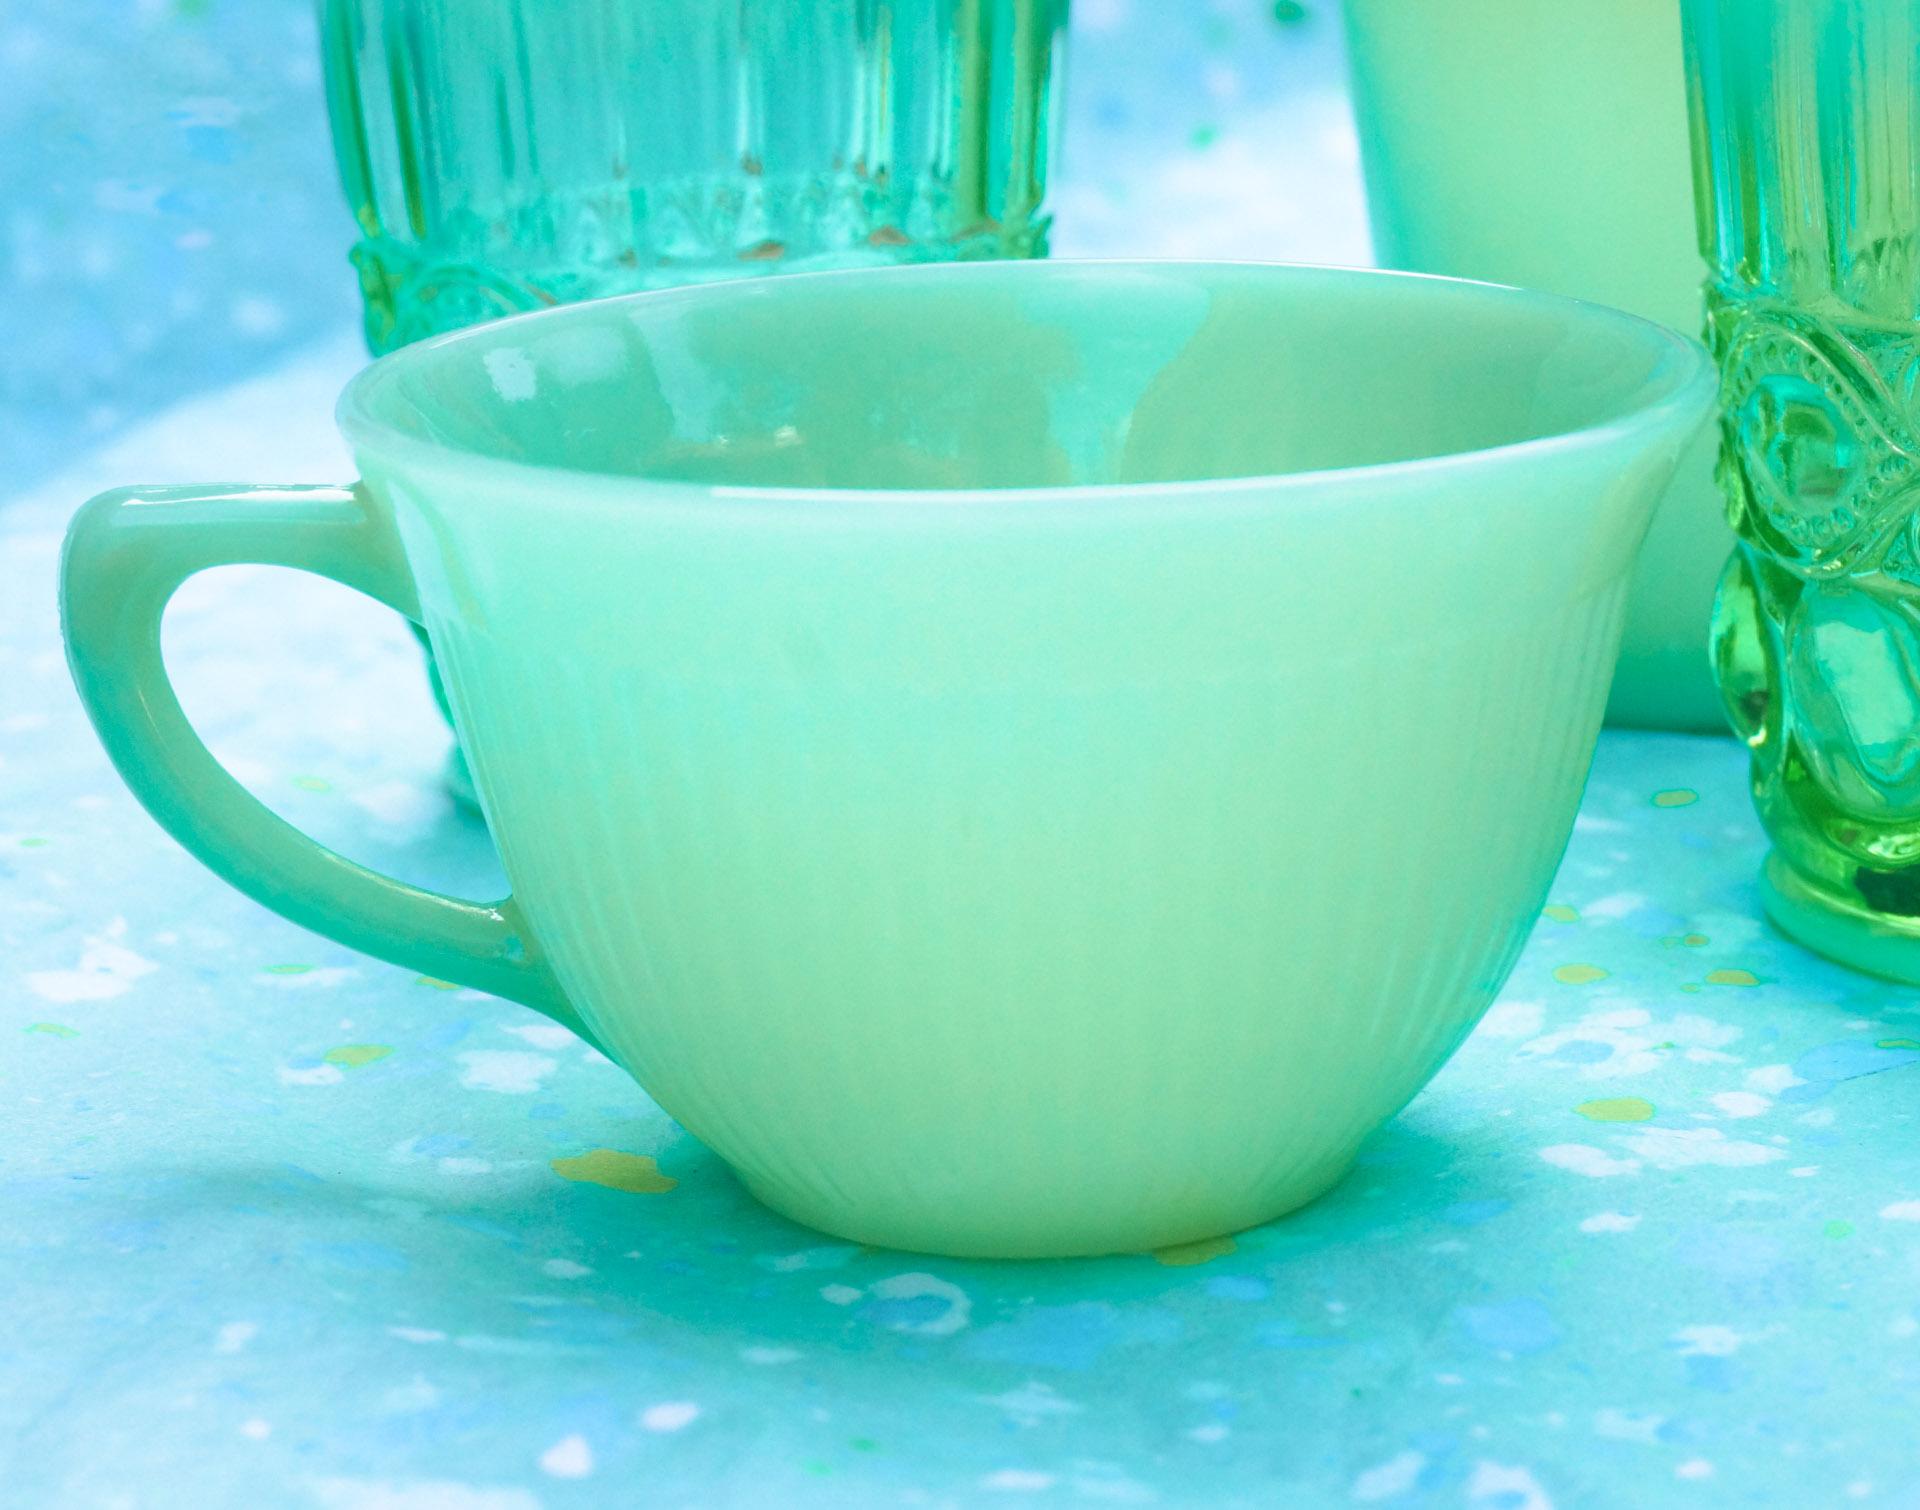 A Jadeite teacup